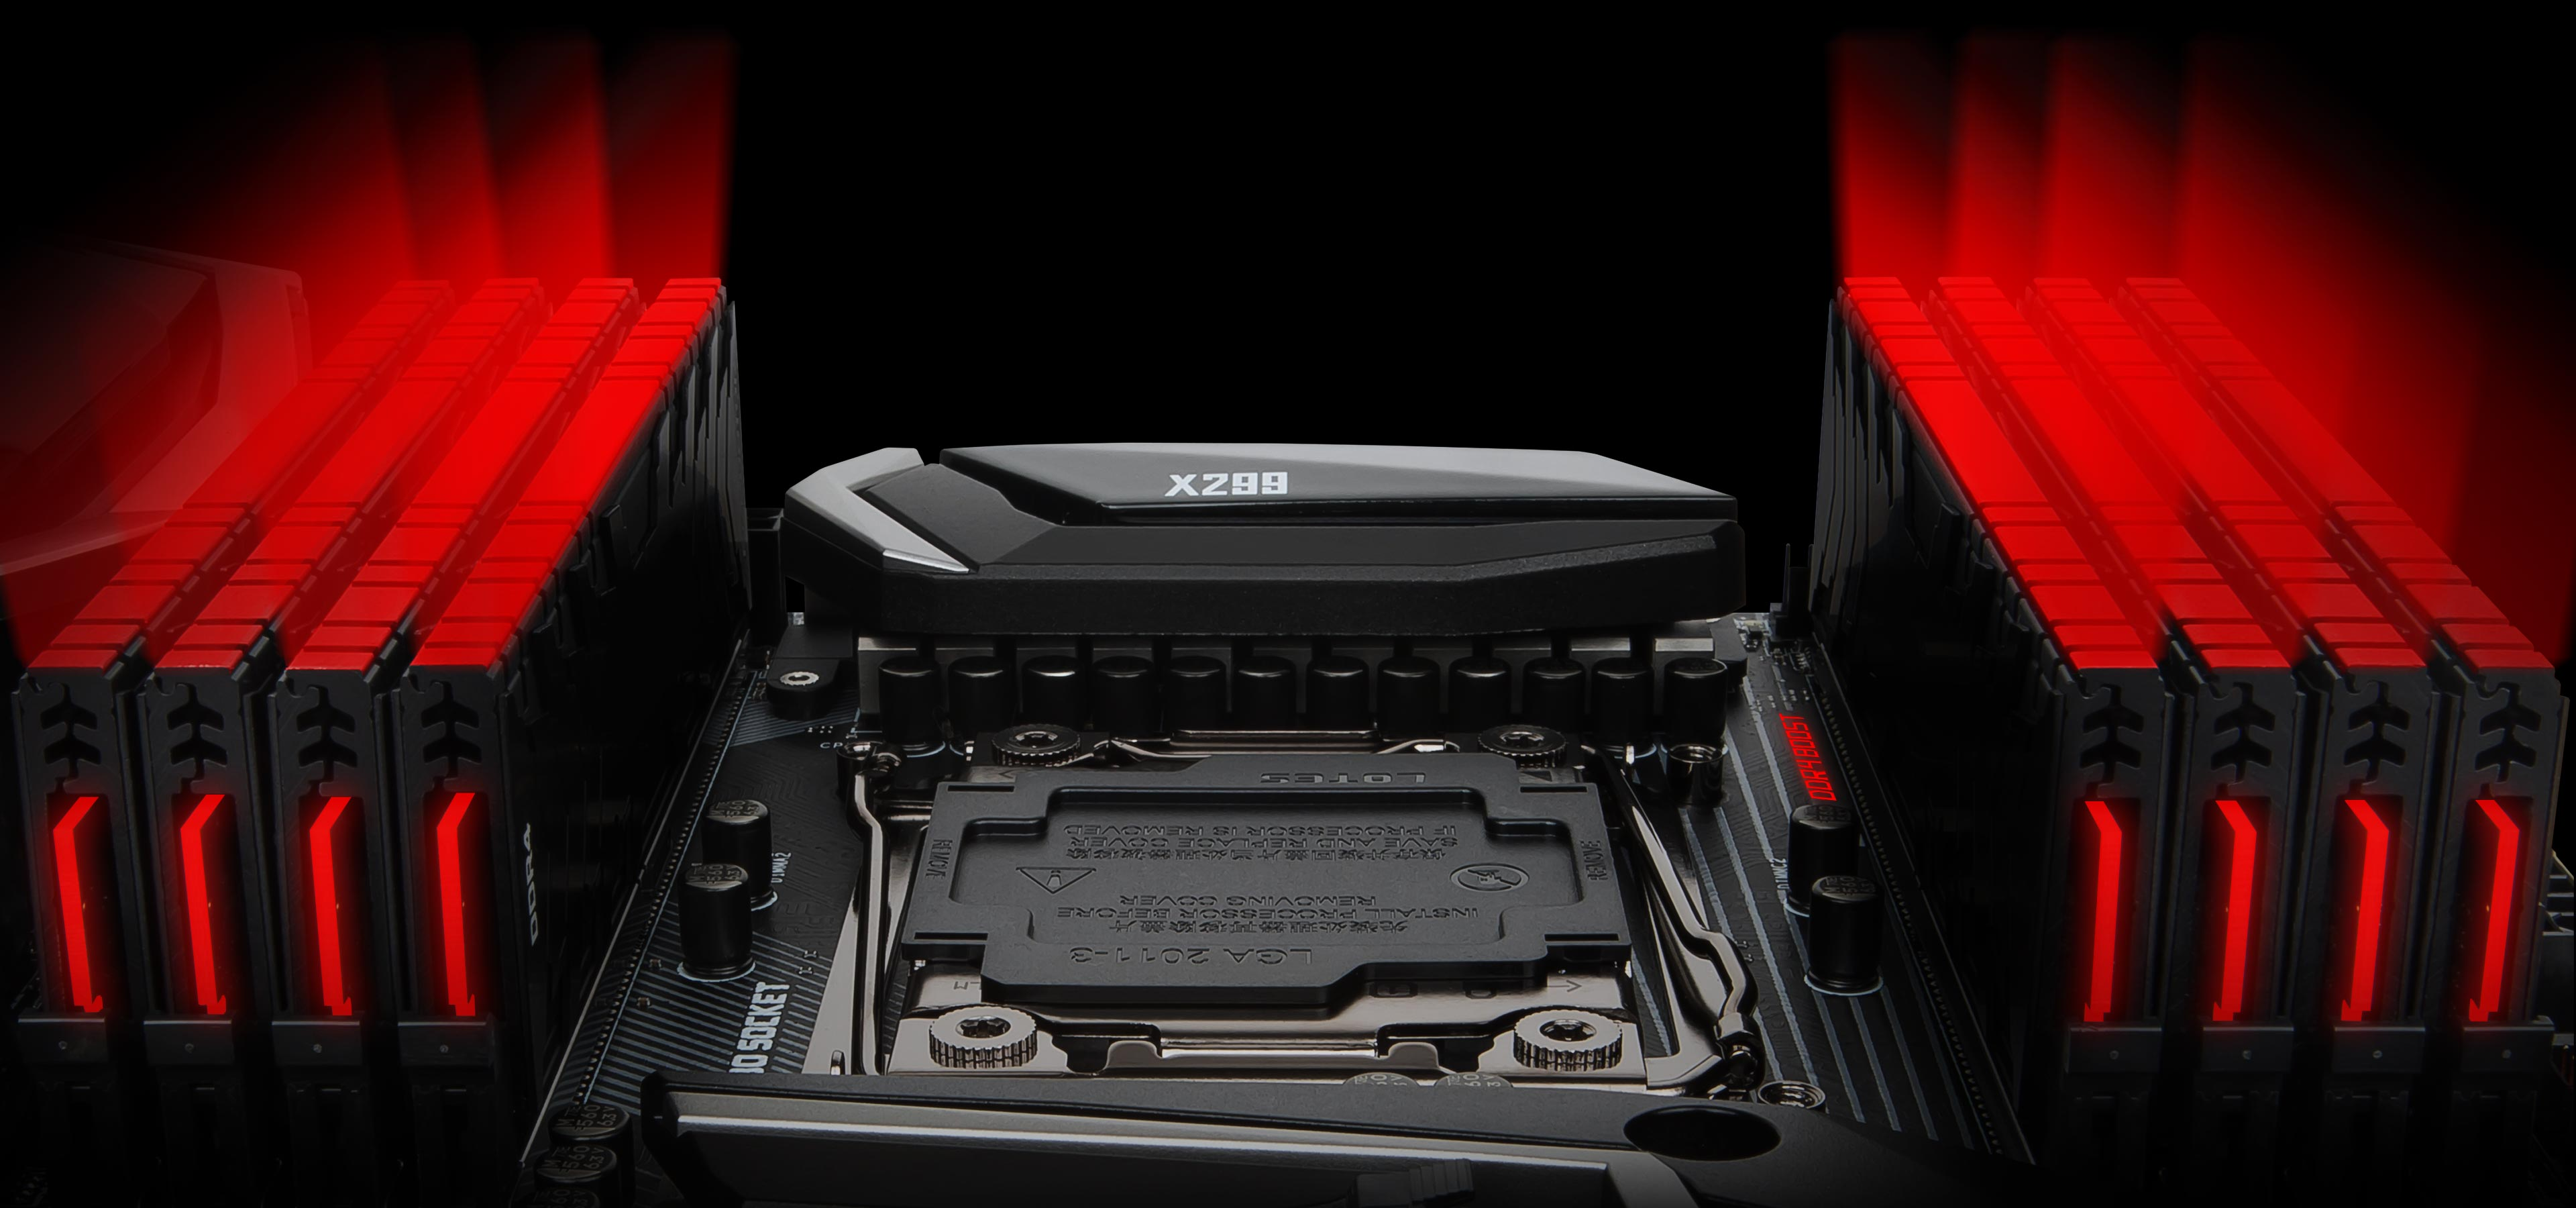 MSI X299 Gaming Pro Carbon AC LGA 2066 ATX Motherboard